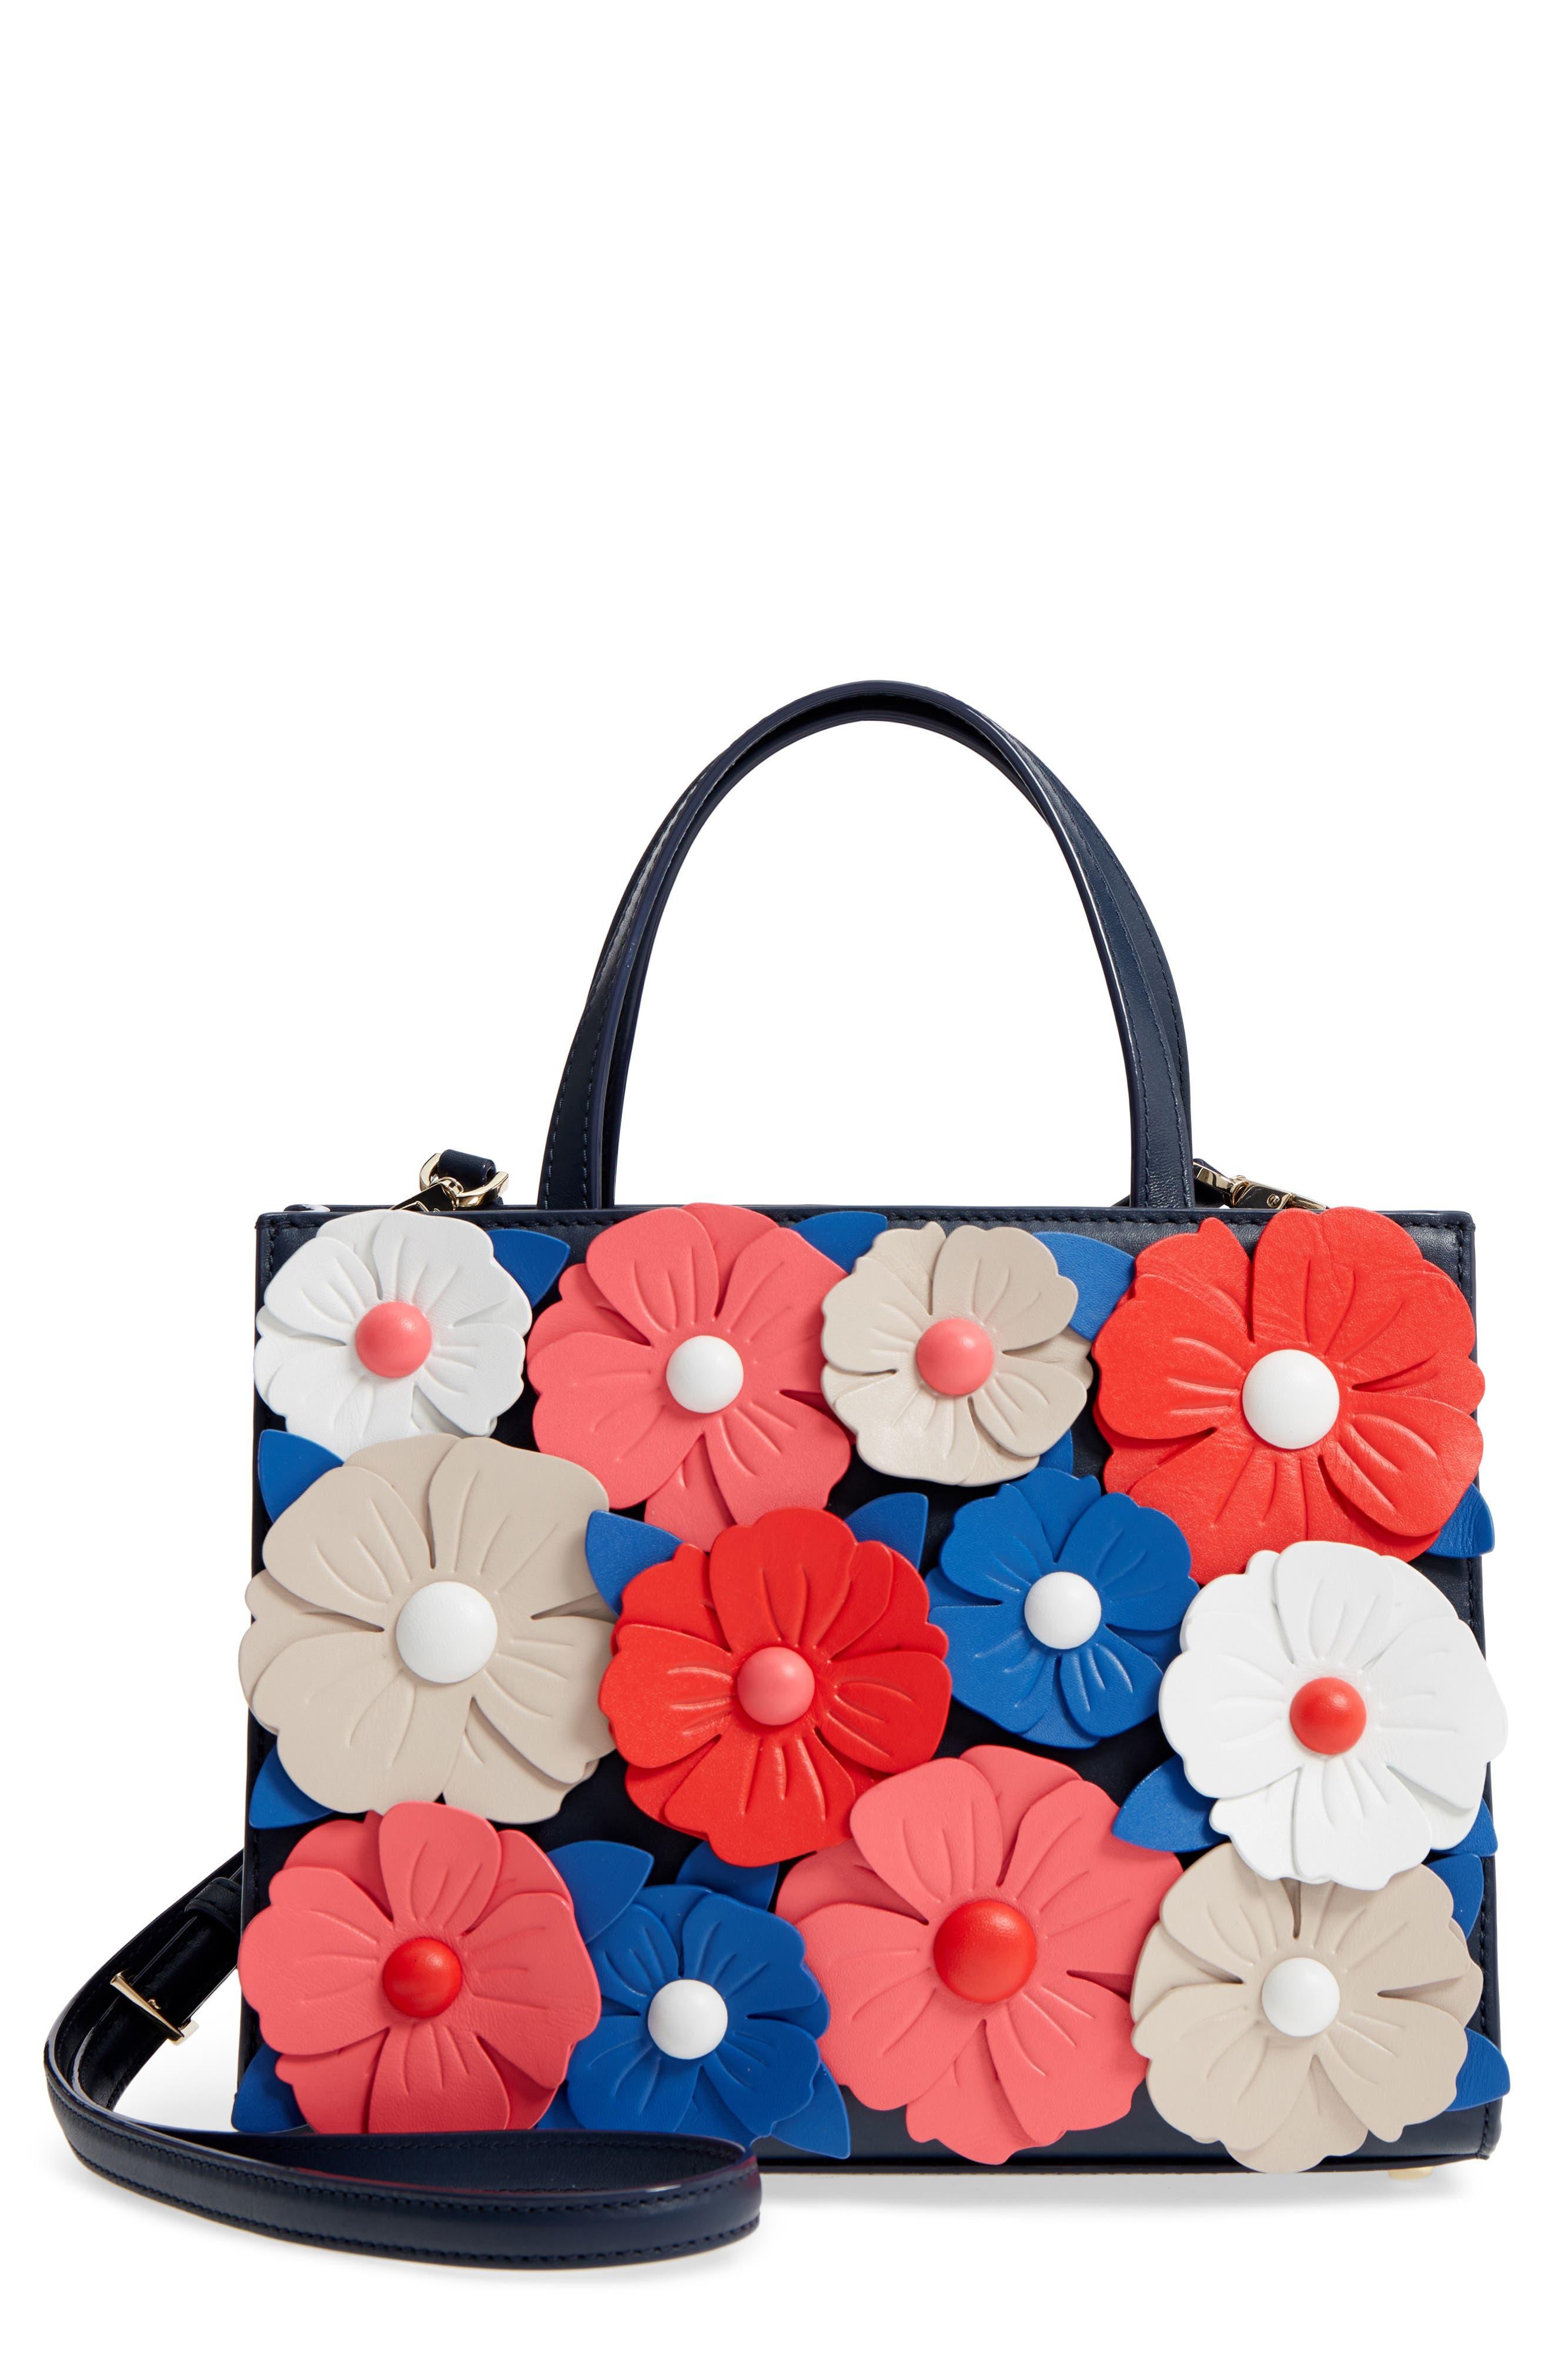 madison daisy lane – sam leather handbag,                             Main thumbnail 1, color,                             400